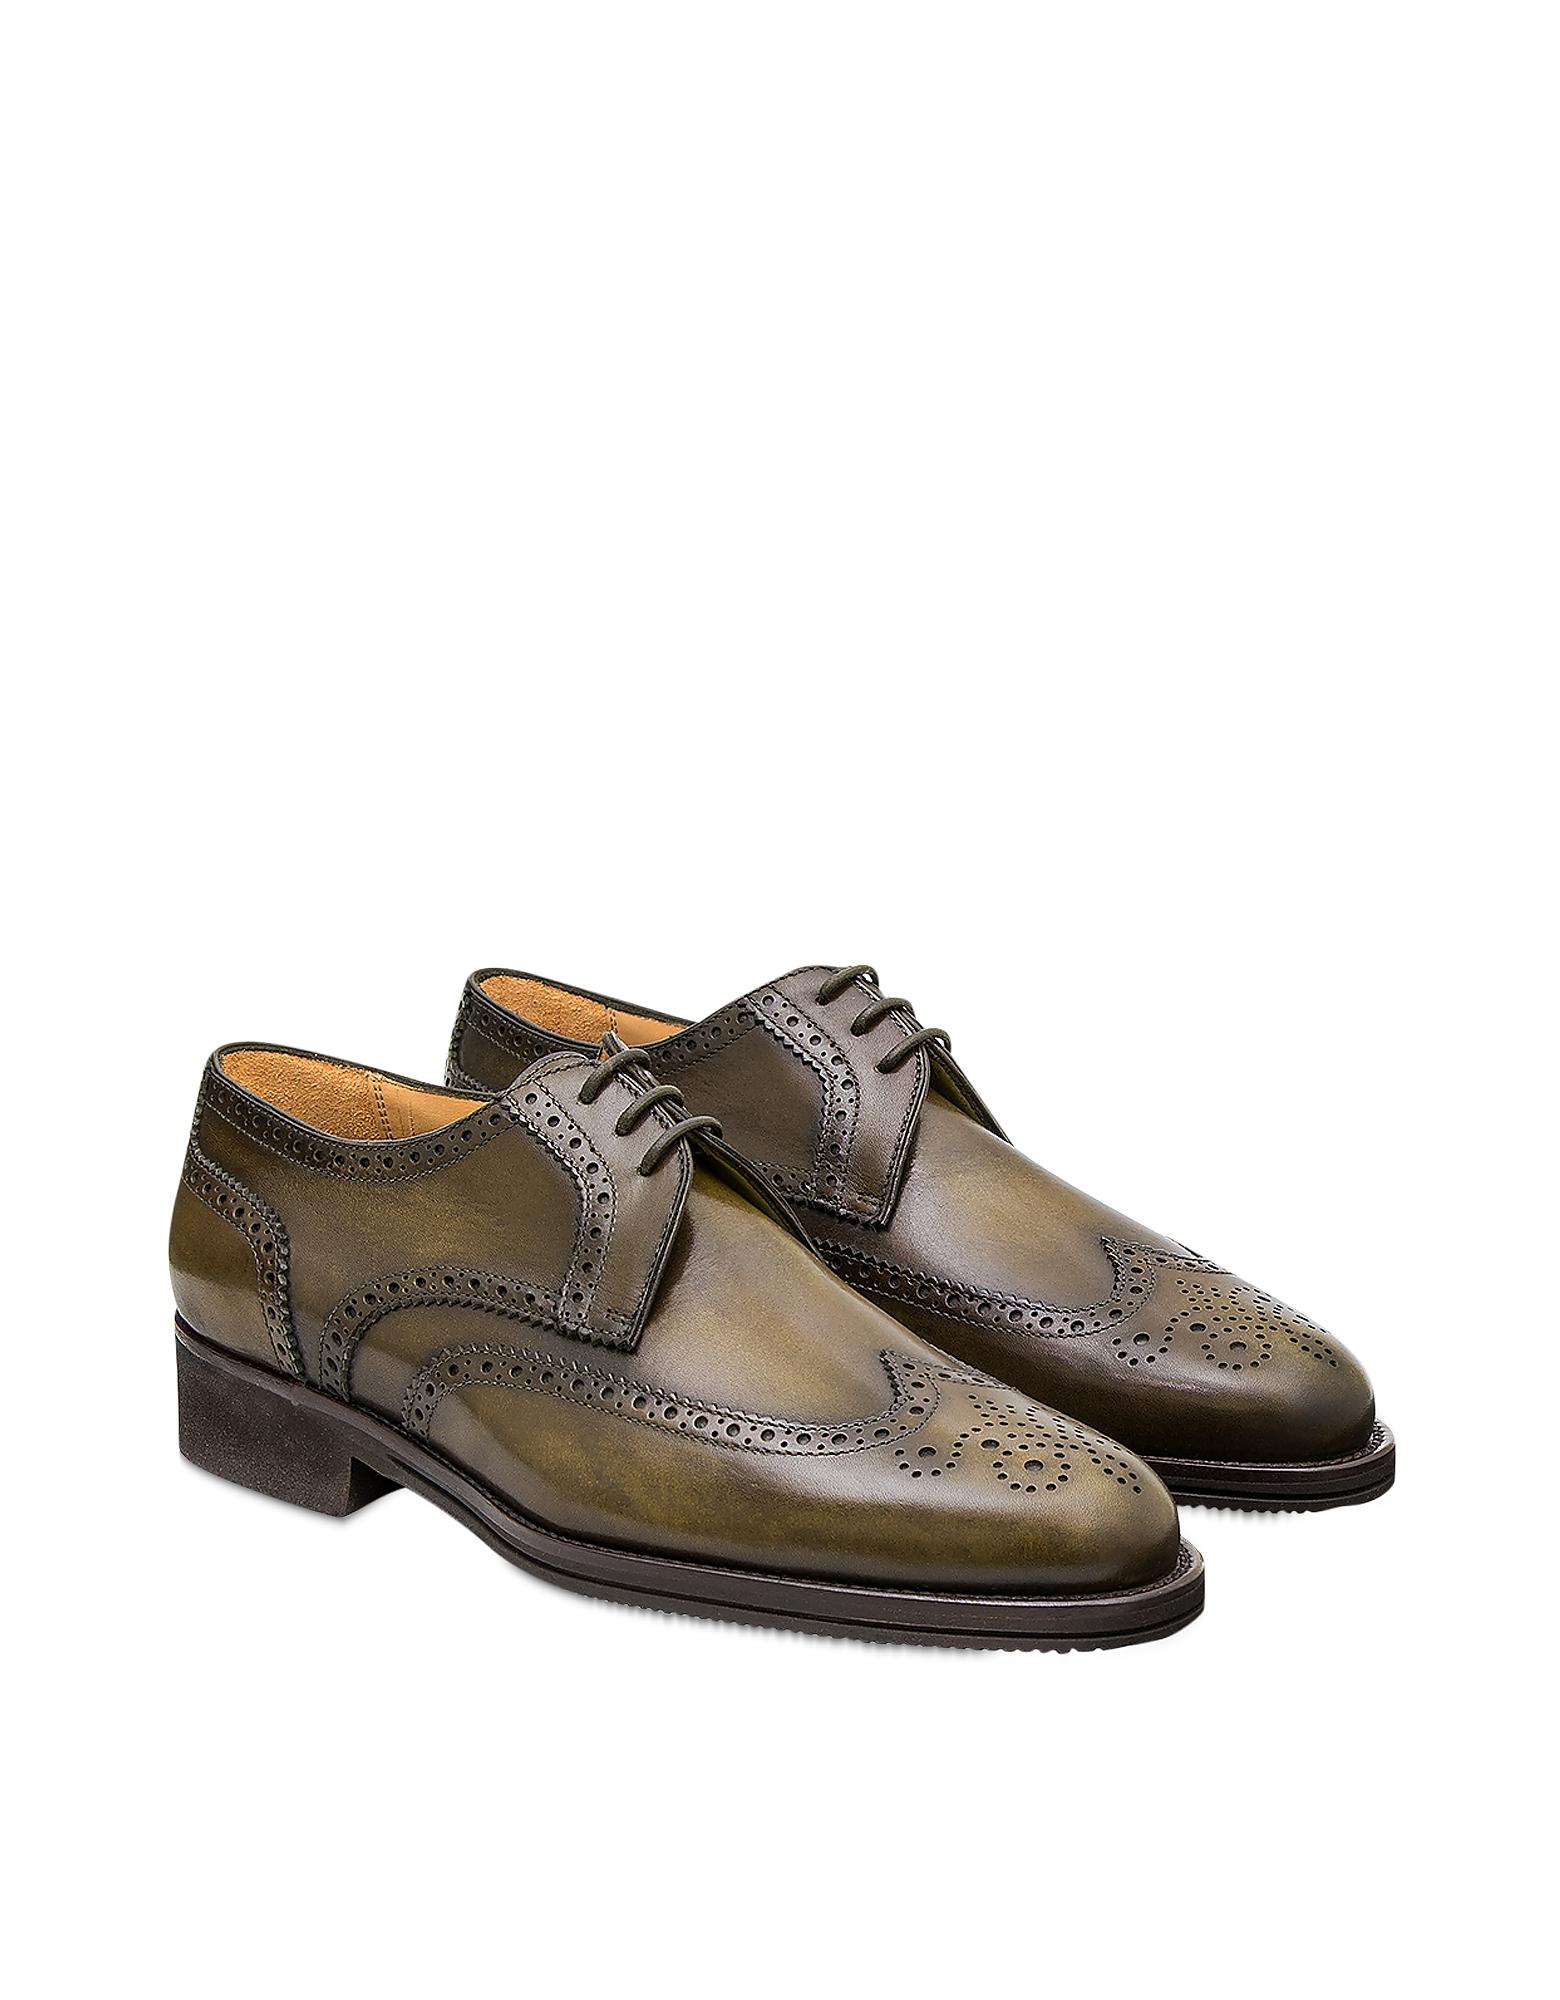 Pakerson Designer Shoes, Olive Pisa Derby Shoe